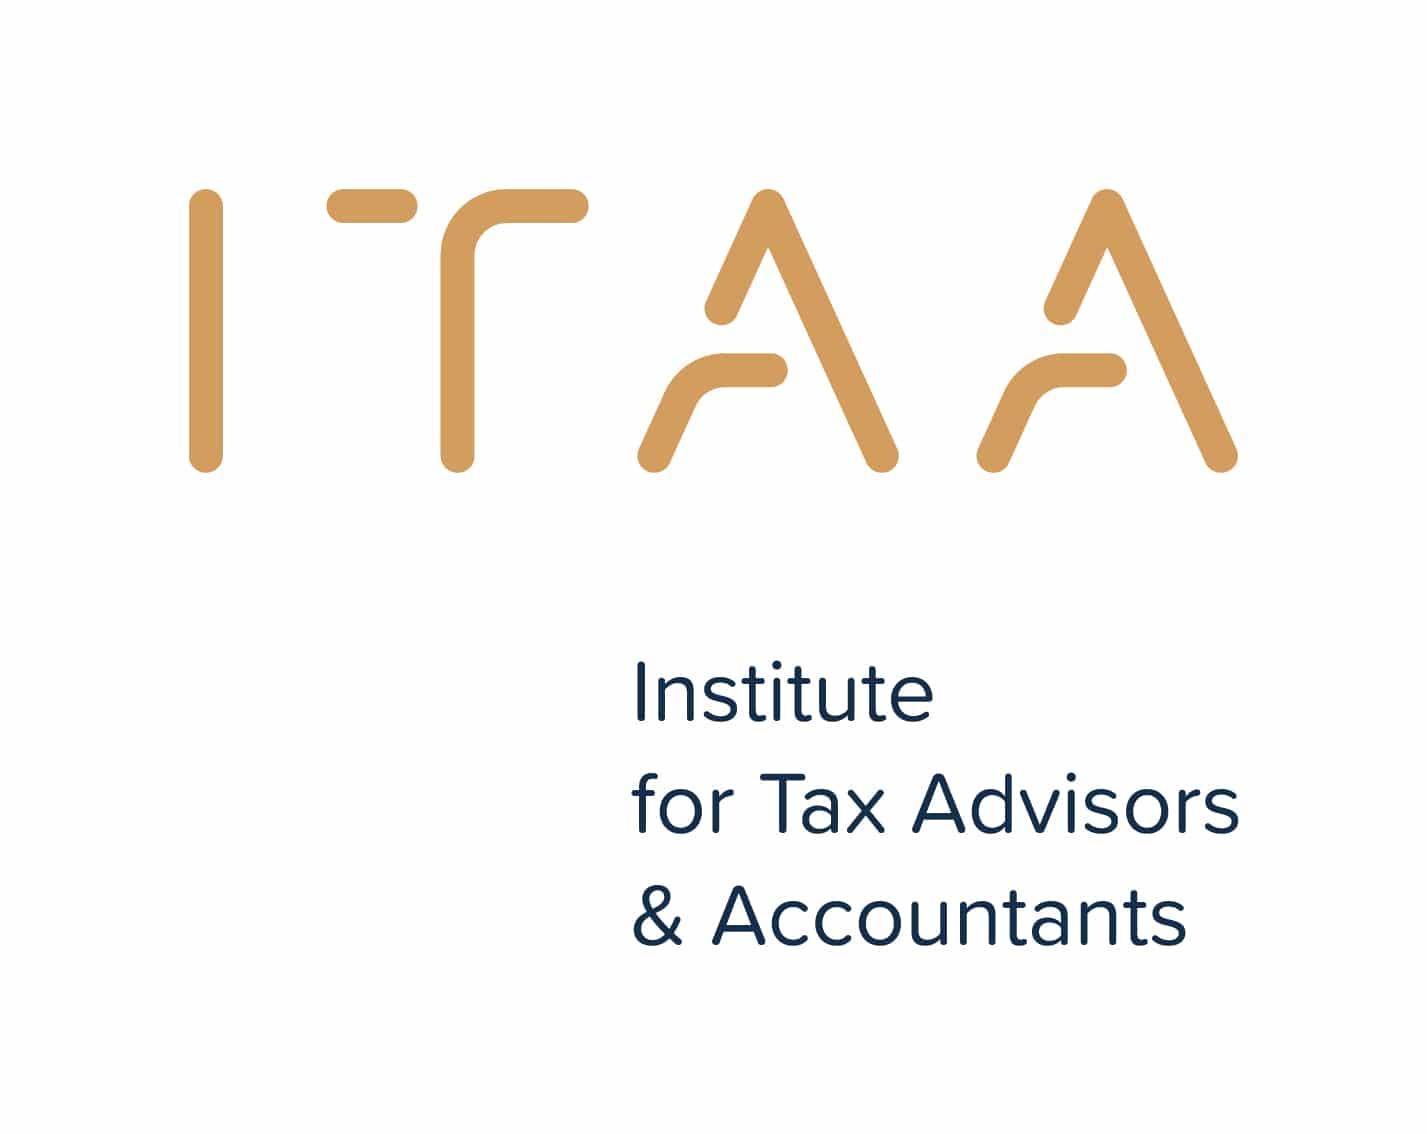 ITAA - Institute for Tax Advisors & Accountants